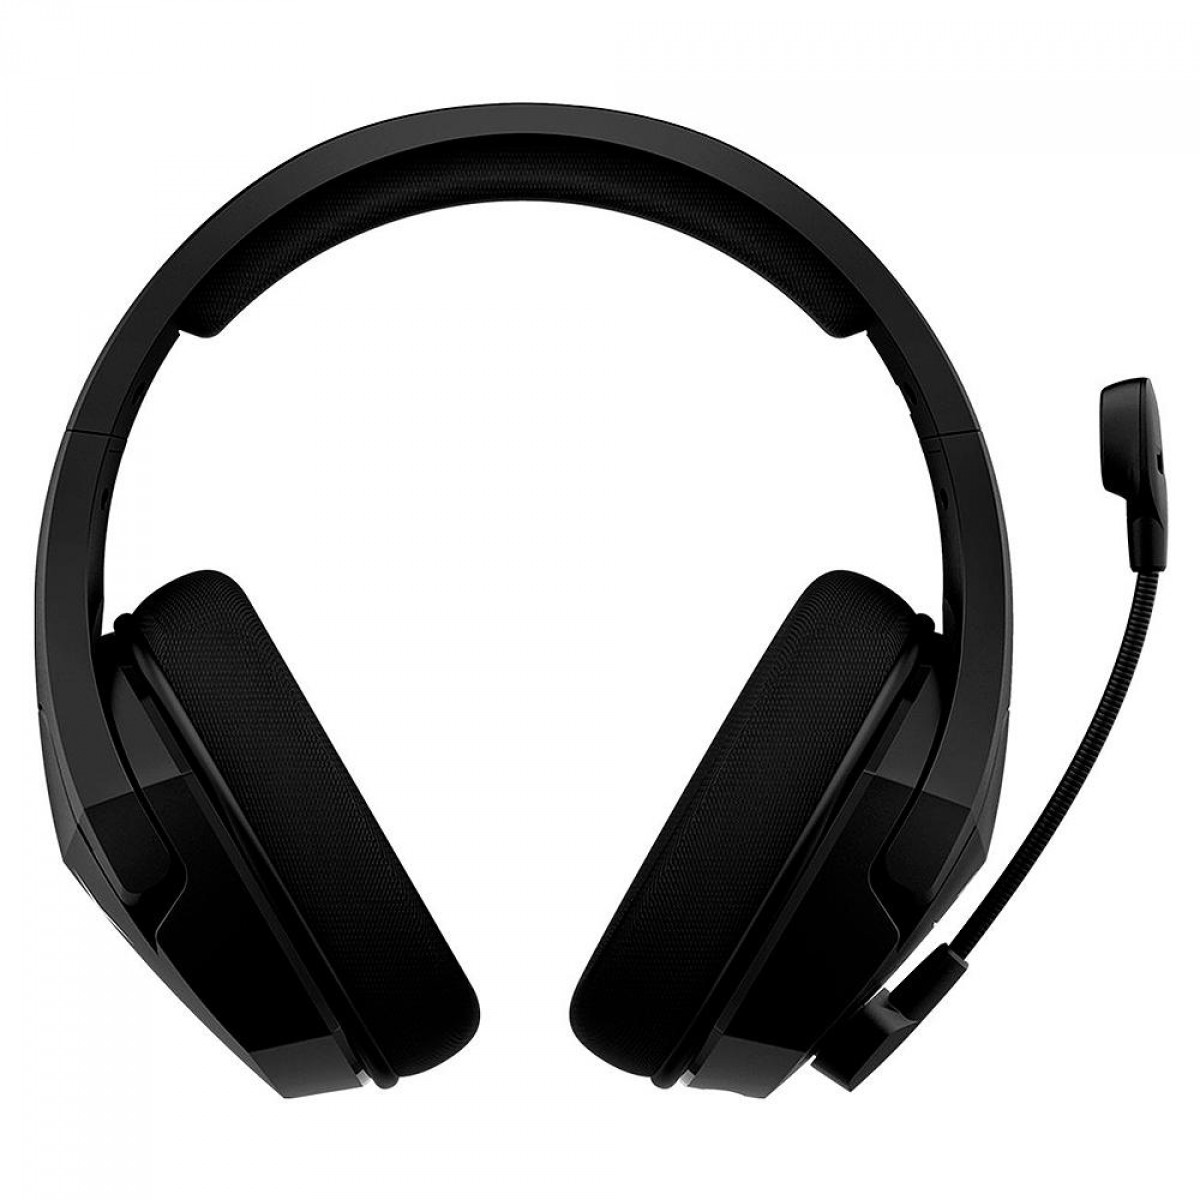 Headset Gamer Wireless HyperX Cloud Stinger Core, Drivers 40mm, 7.1 Surround, USB, Black, HHSS1C-BA-BK/G